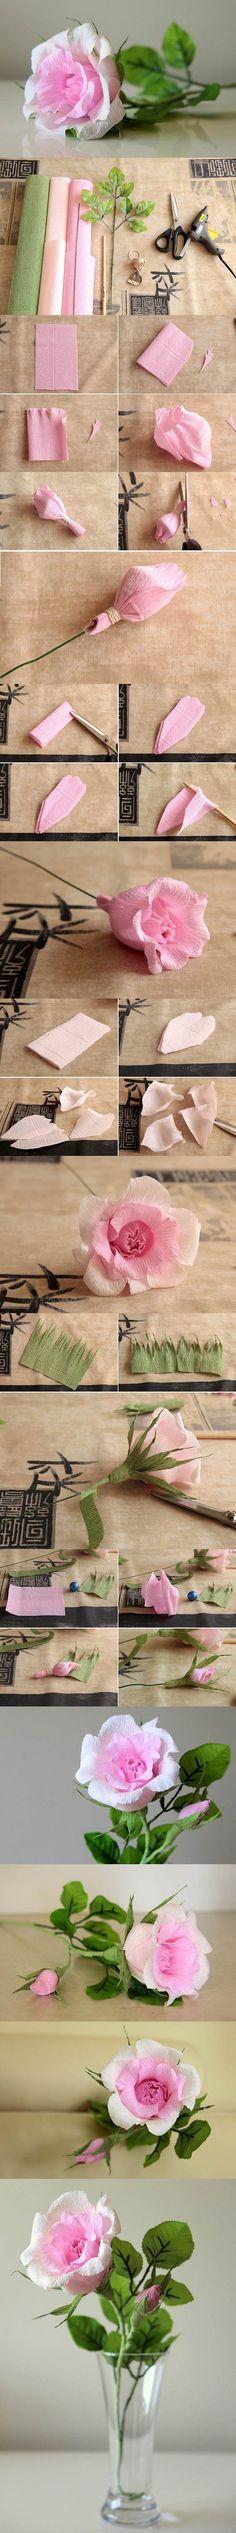 DIY Beautiful Pink Crepe Paper Rose   iCreativeIdeas.com LIKE Us on Facebook == https://www.facebook.com/icreativeideas